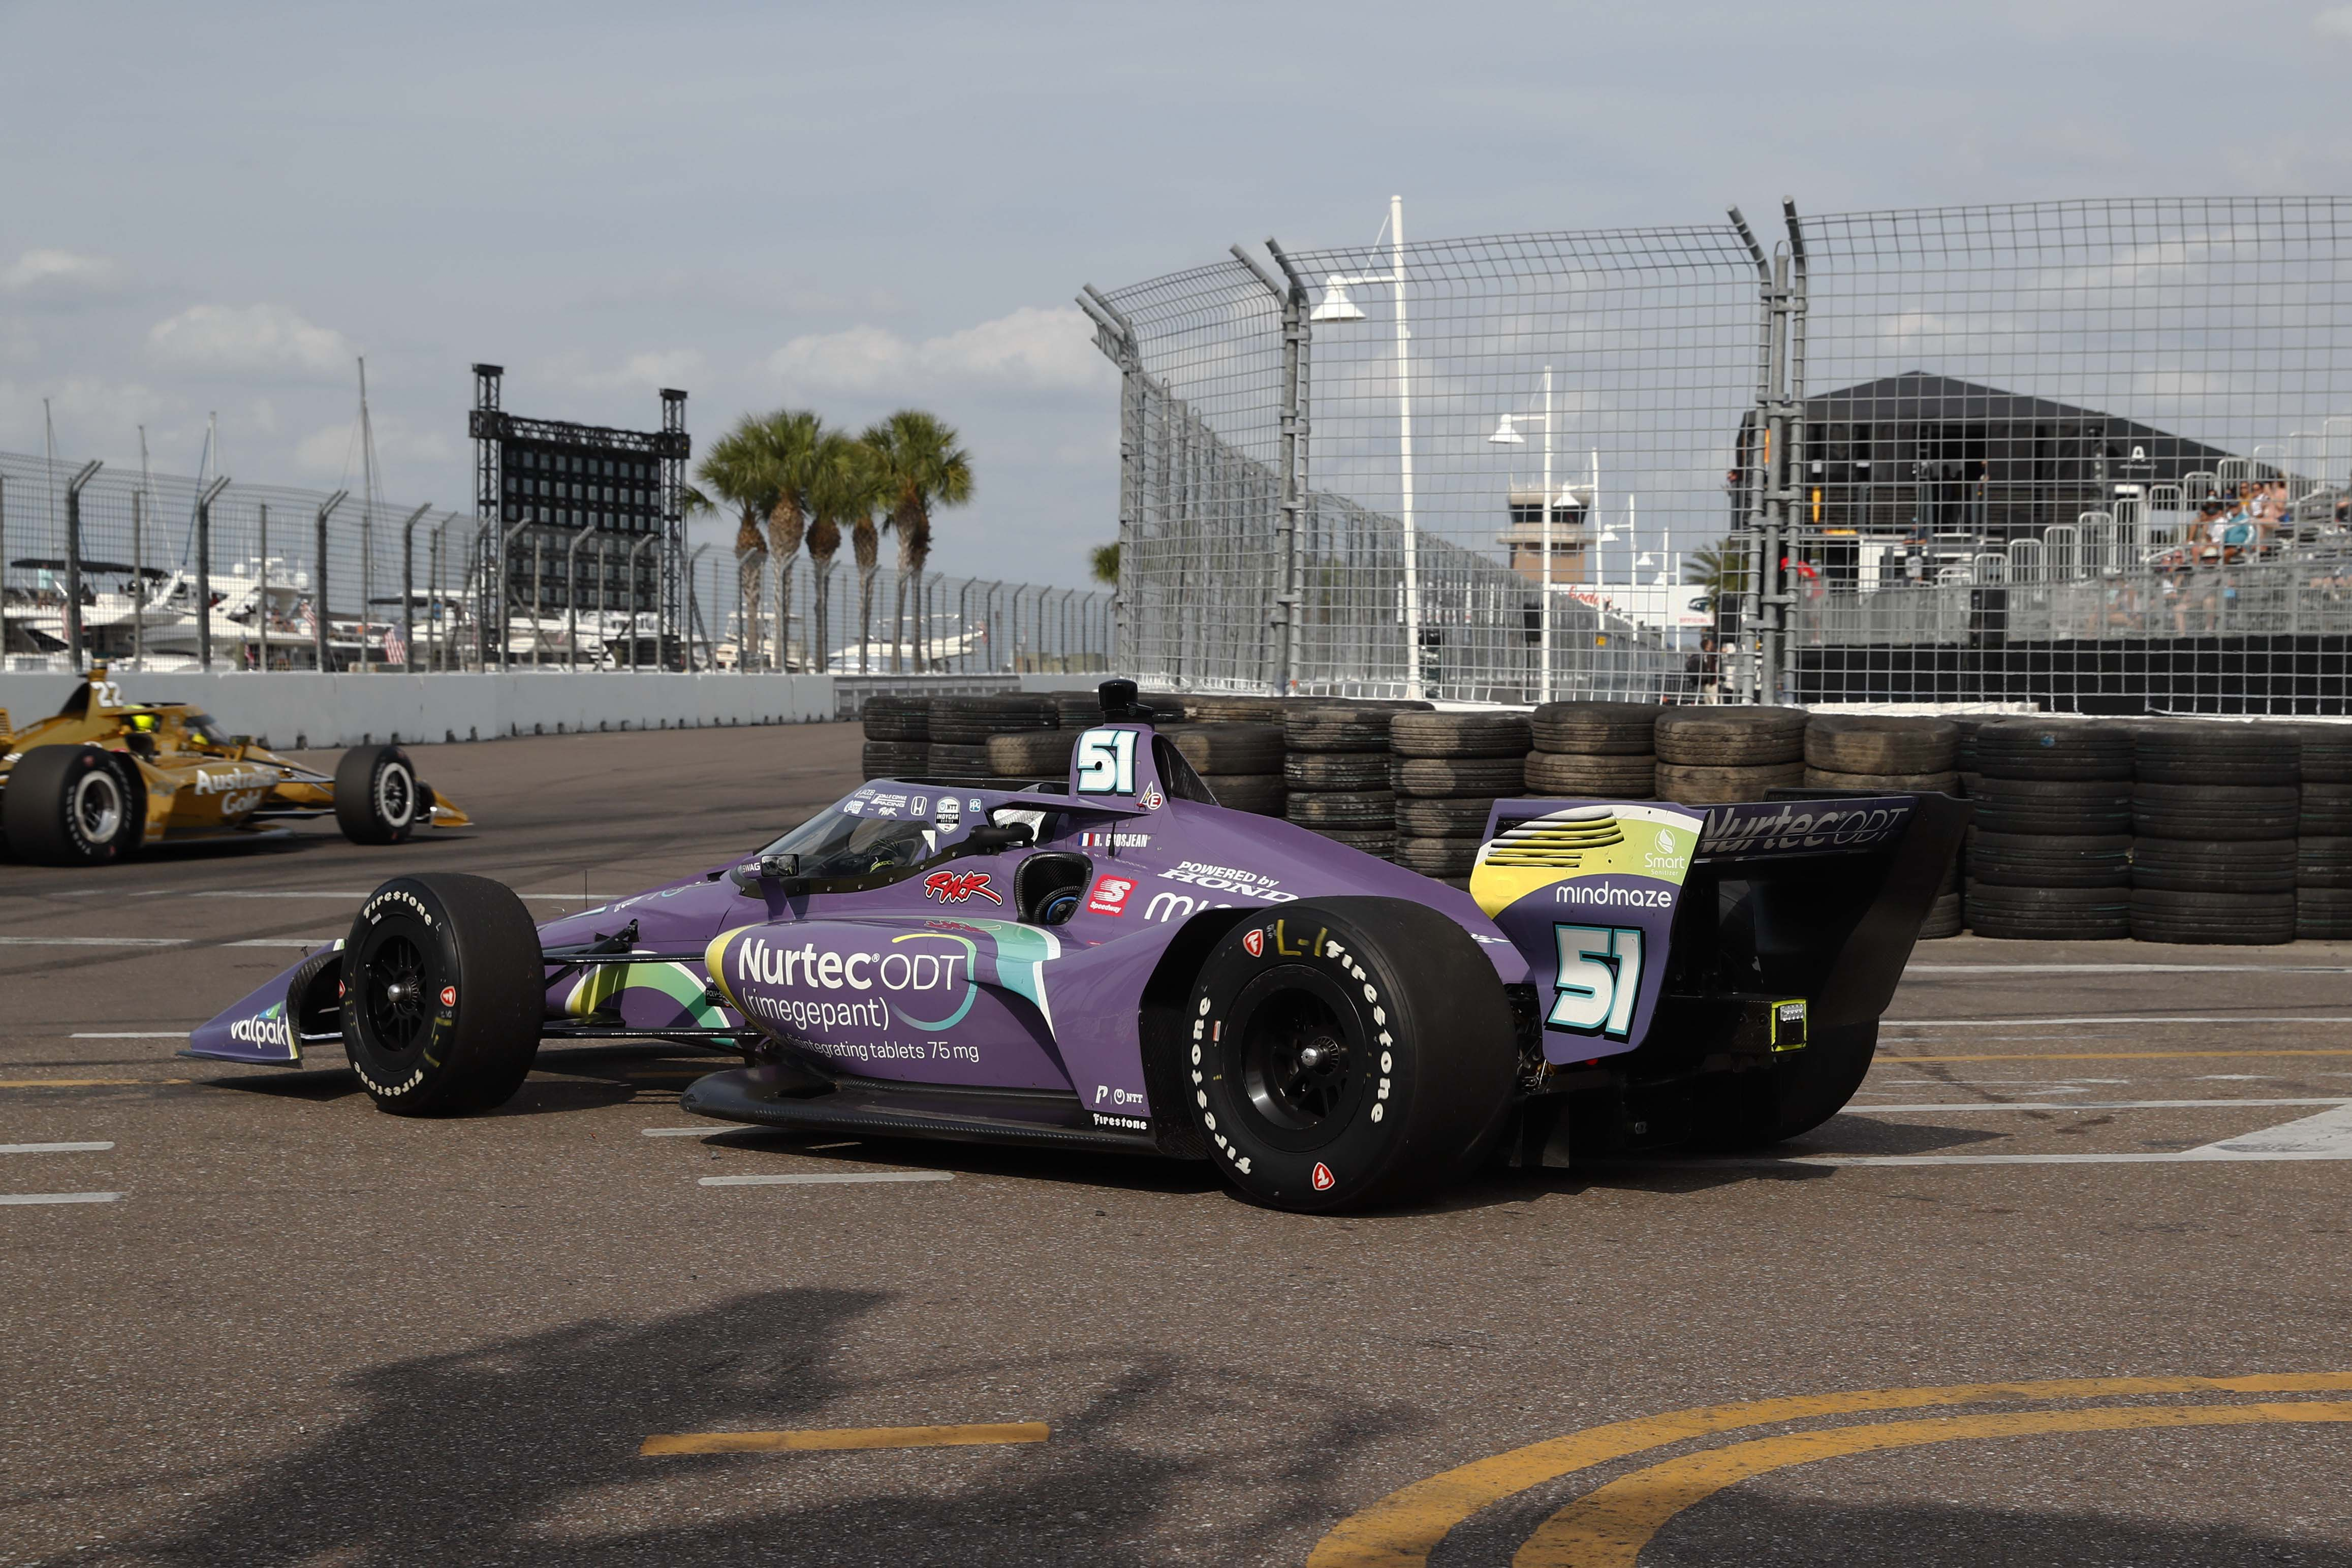 Romain Grosjean - St Petersburg Grand Prix - Indycar Series